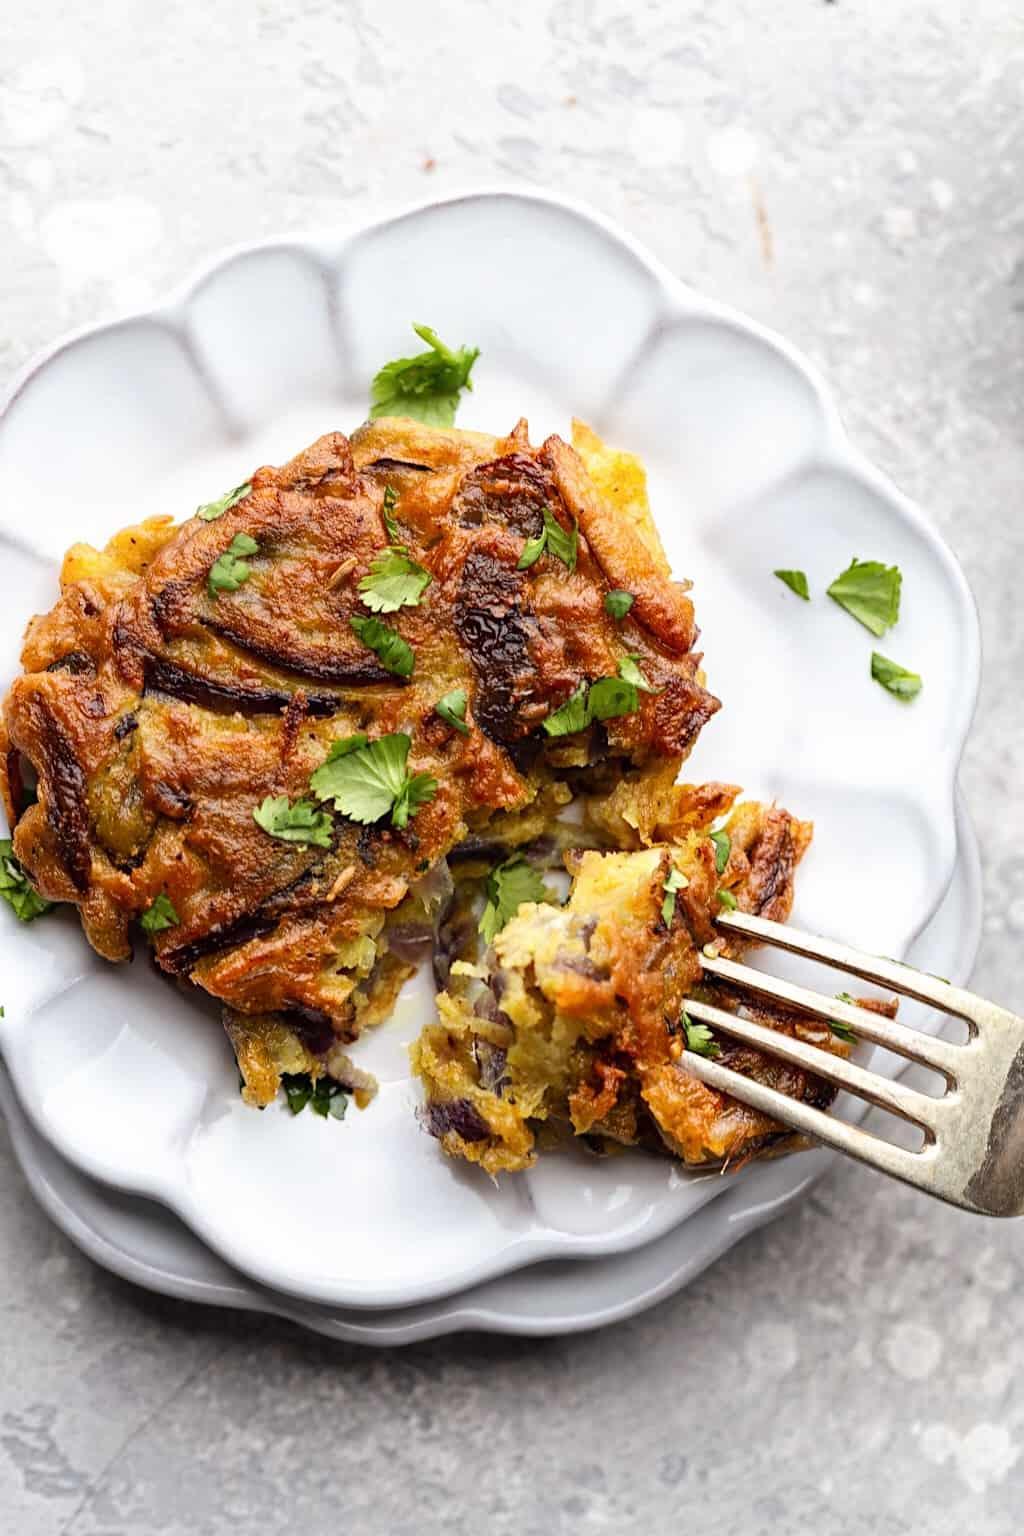 Easy Vegan Onion Bhajis #onion #bhaji #vegan #recipe #indianfood #glutenfree